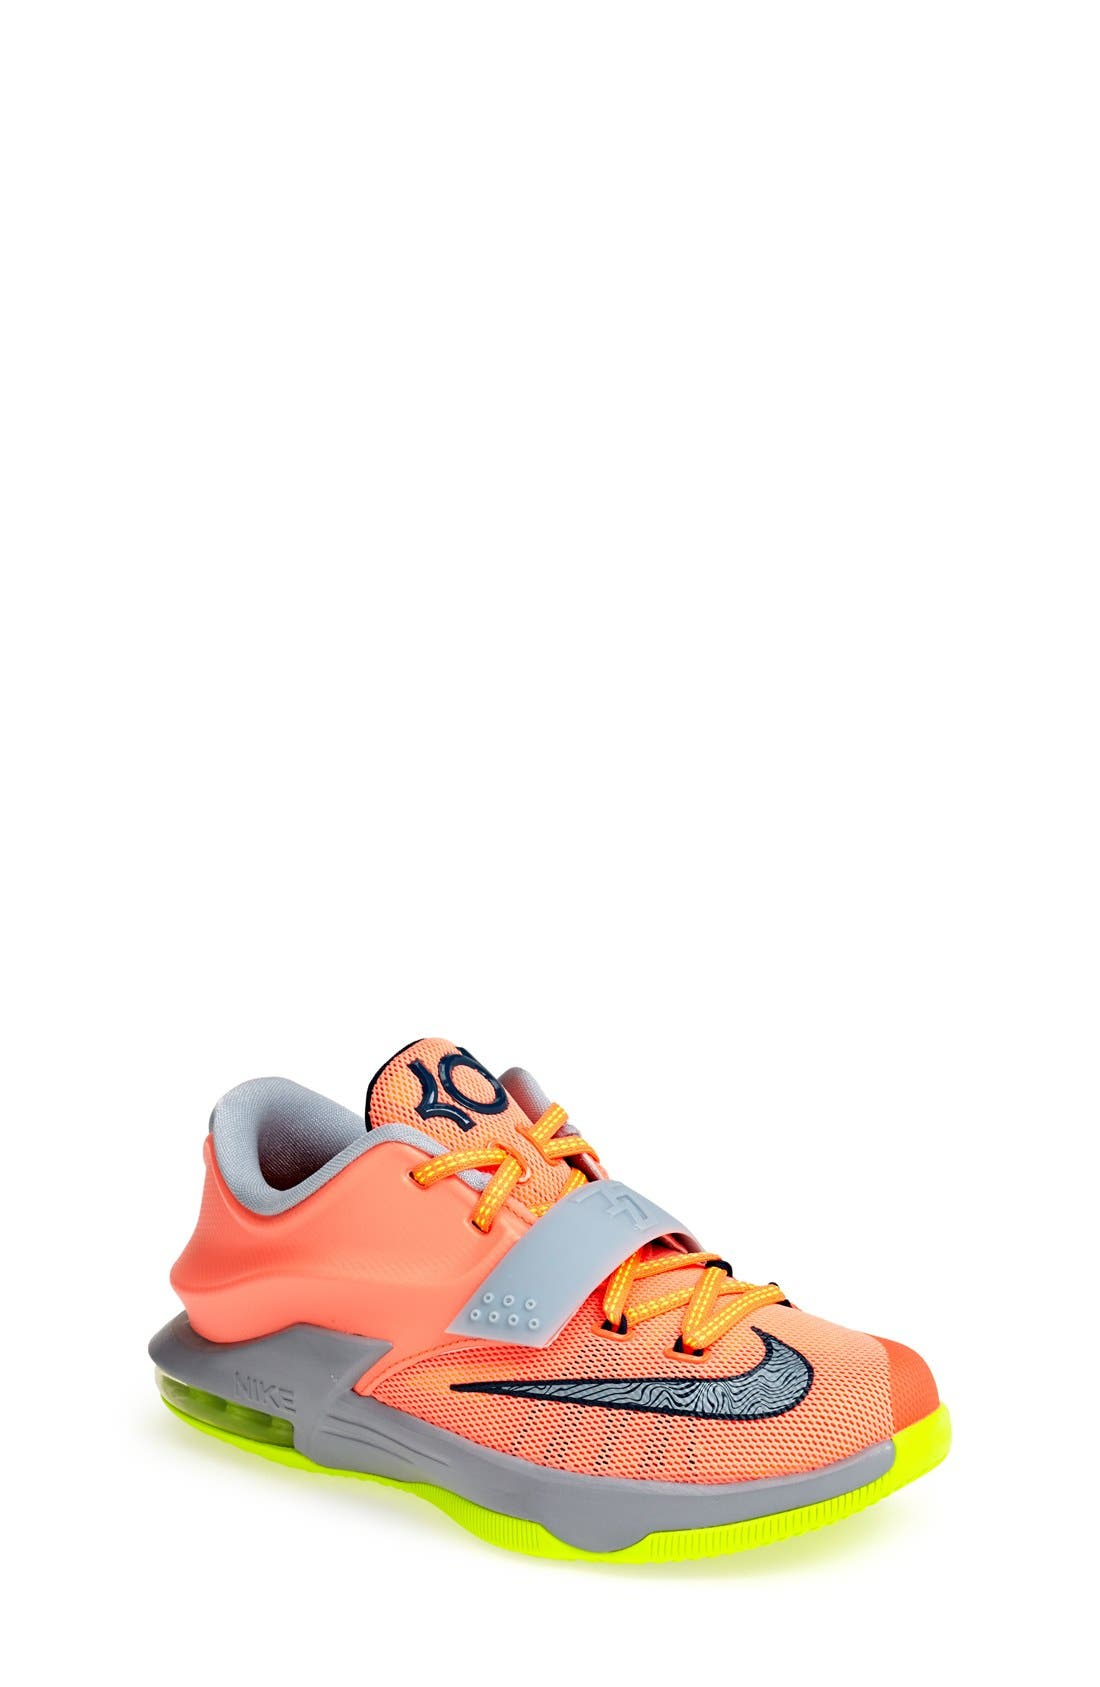 Main Image - Nike 'KD VII' Basketball Shoe (Big Kid)